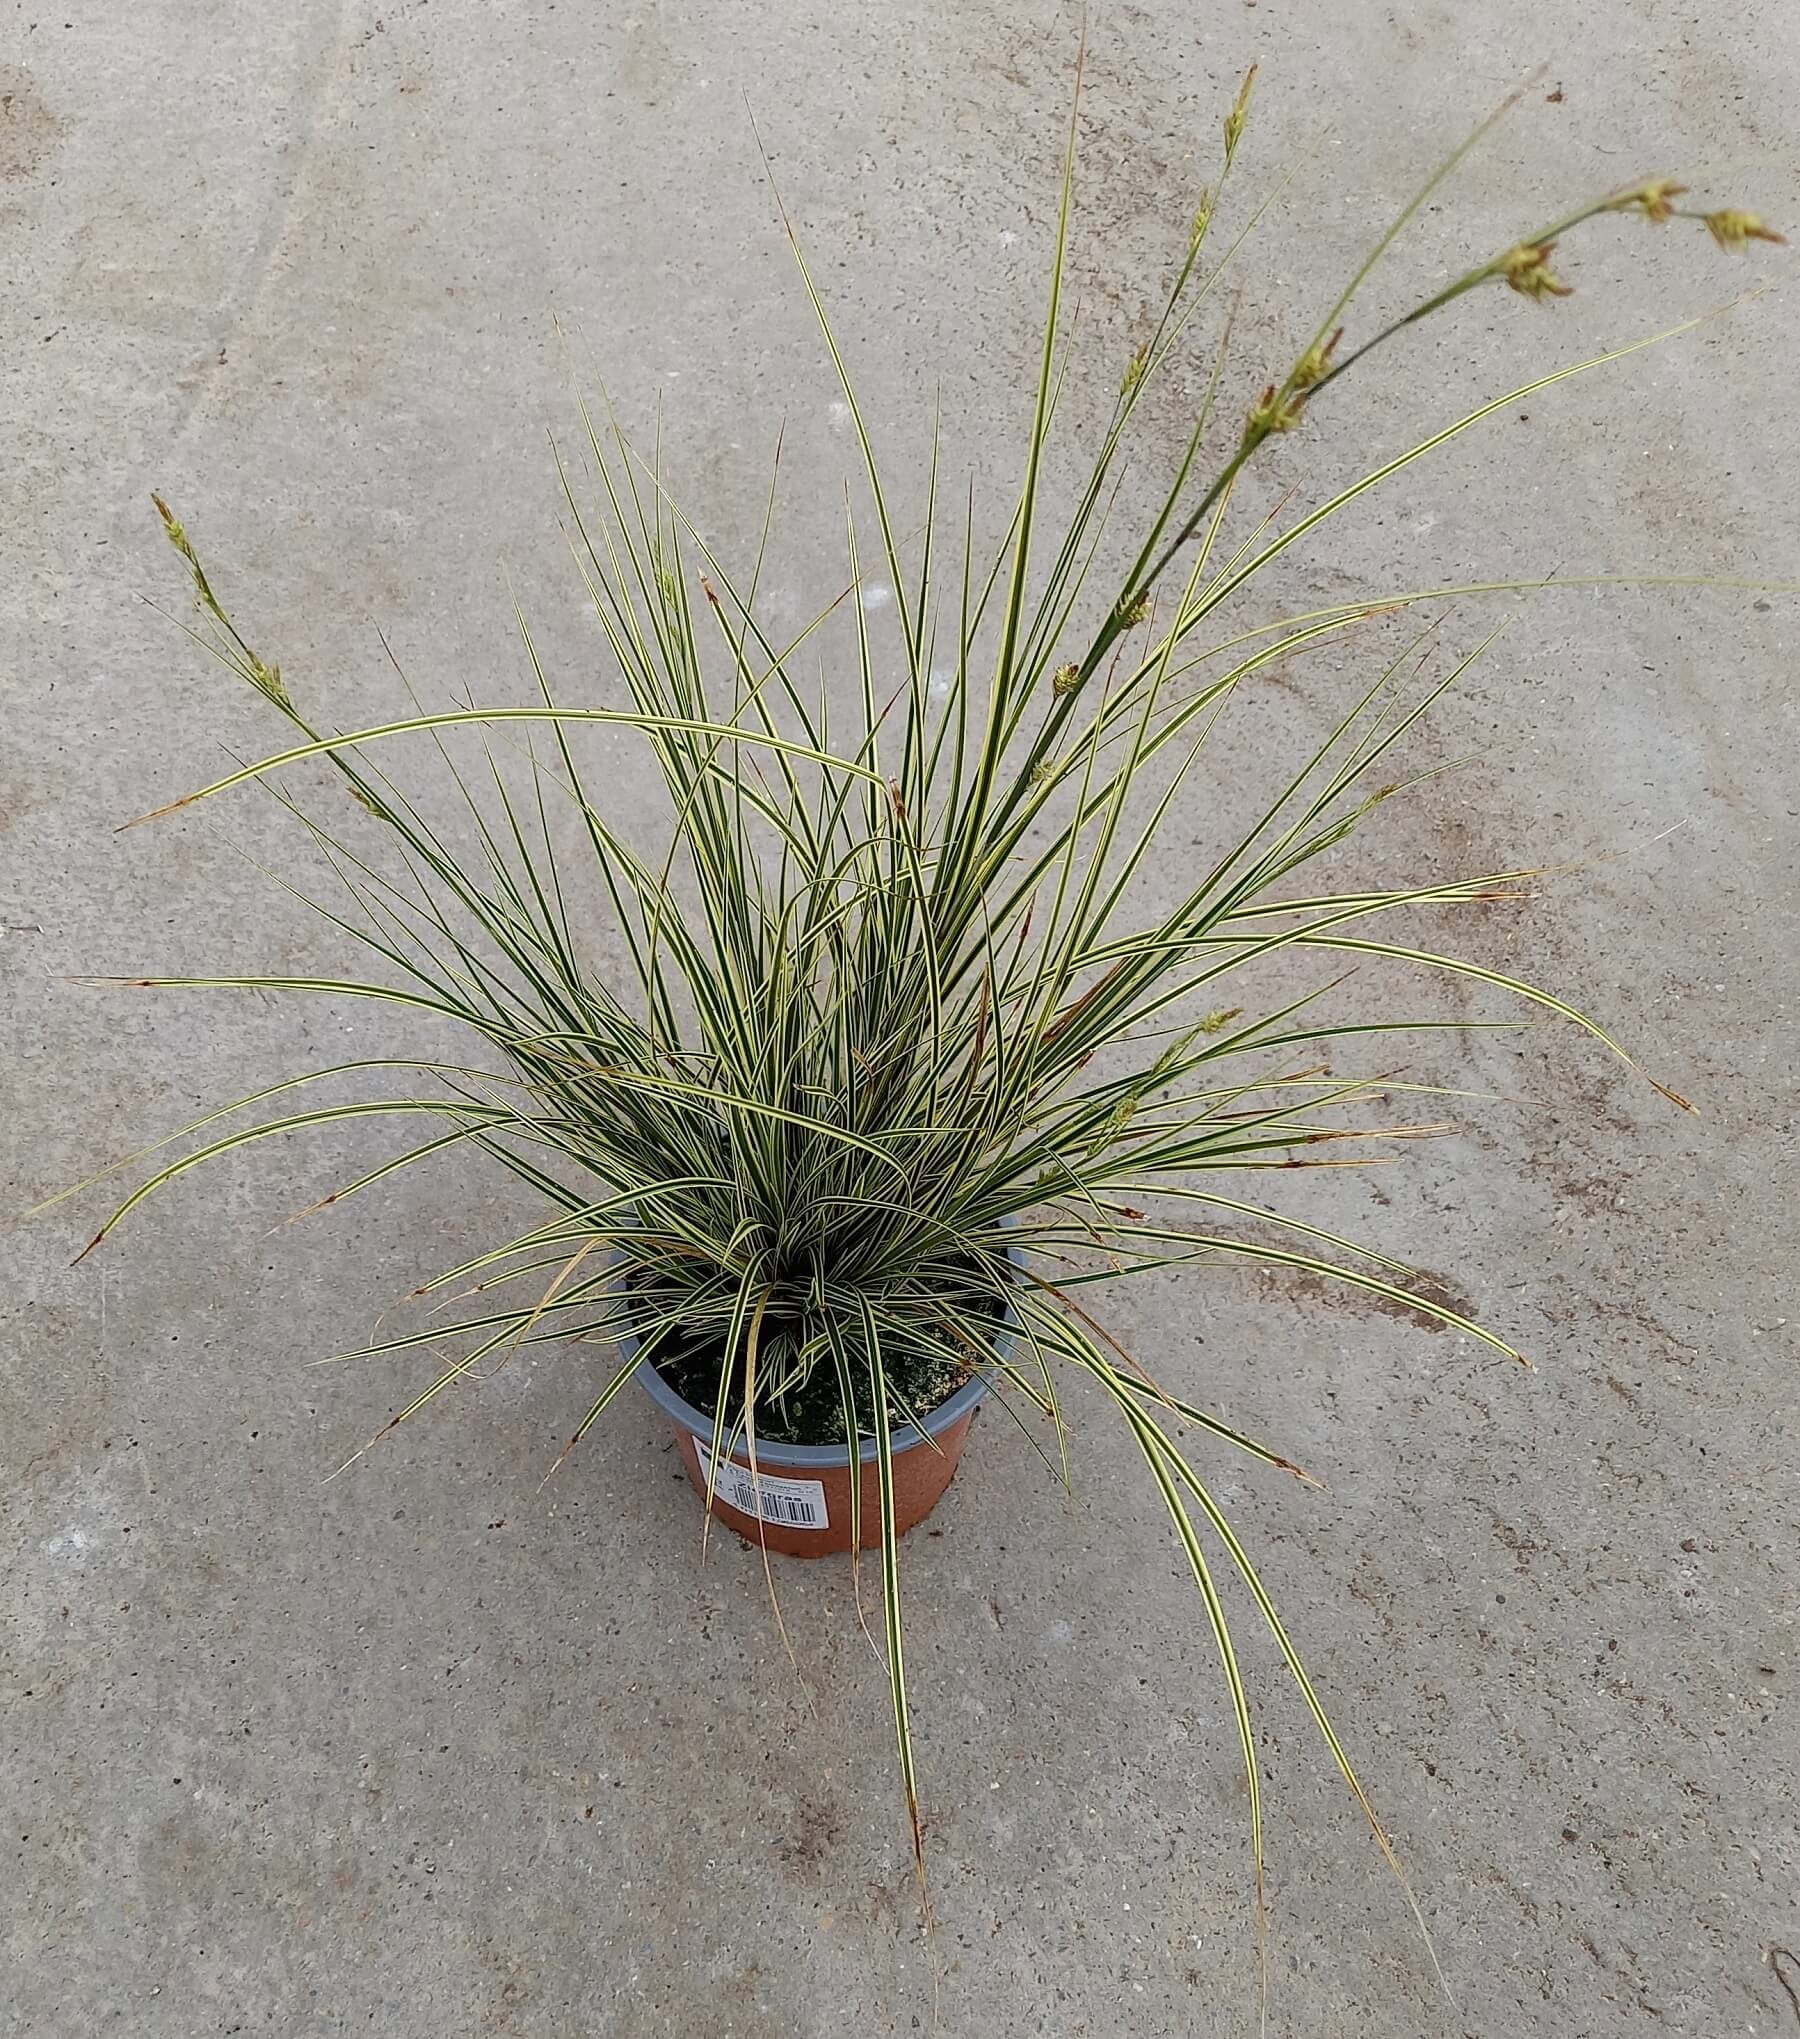 Bräunliche Segge (Carex brunnea) 'Albolineata' T12 - winterhart